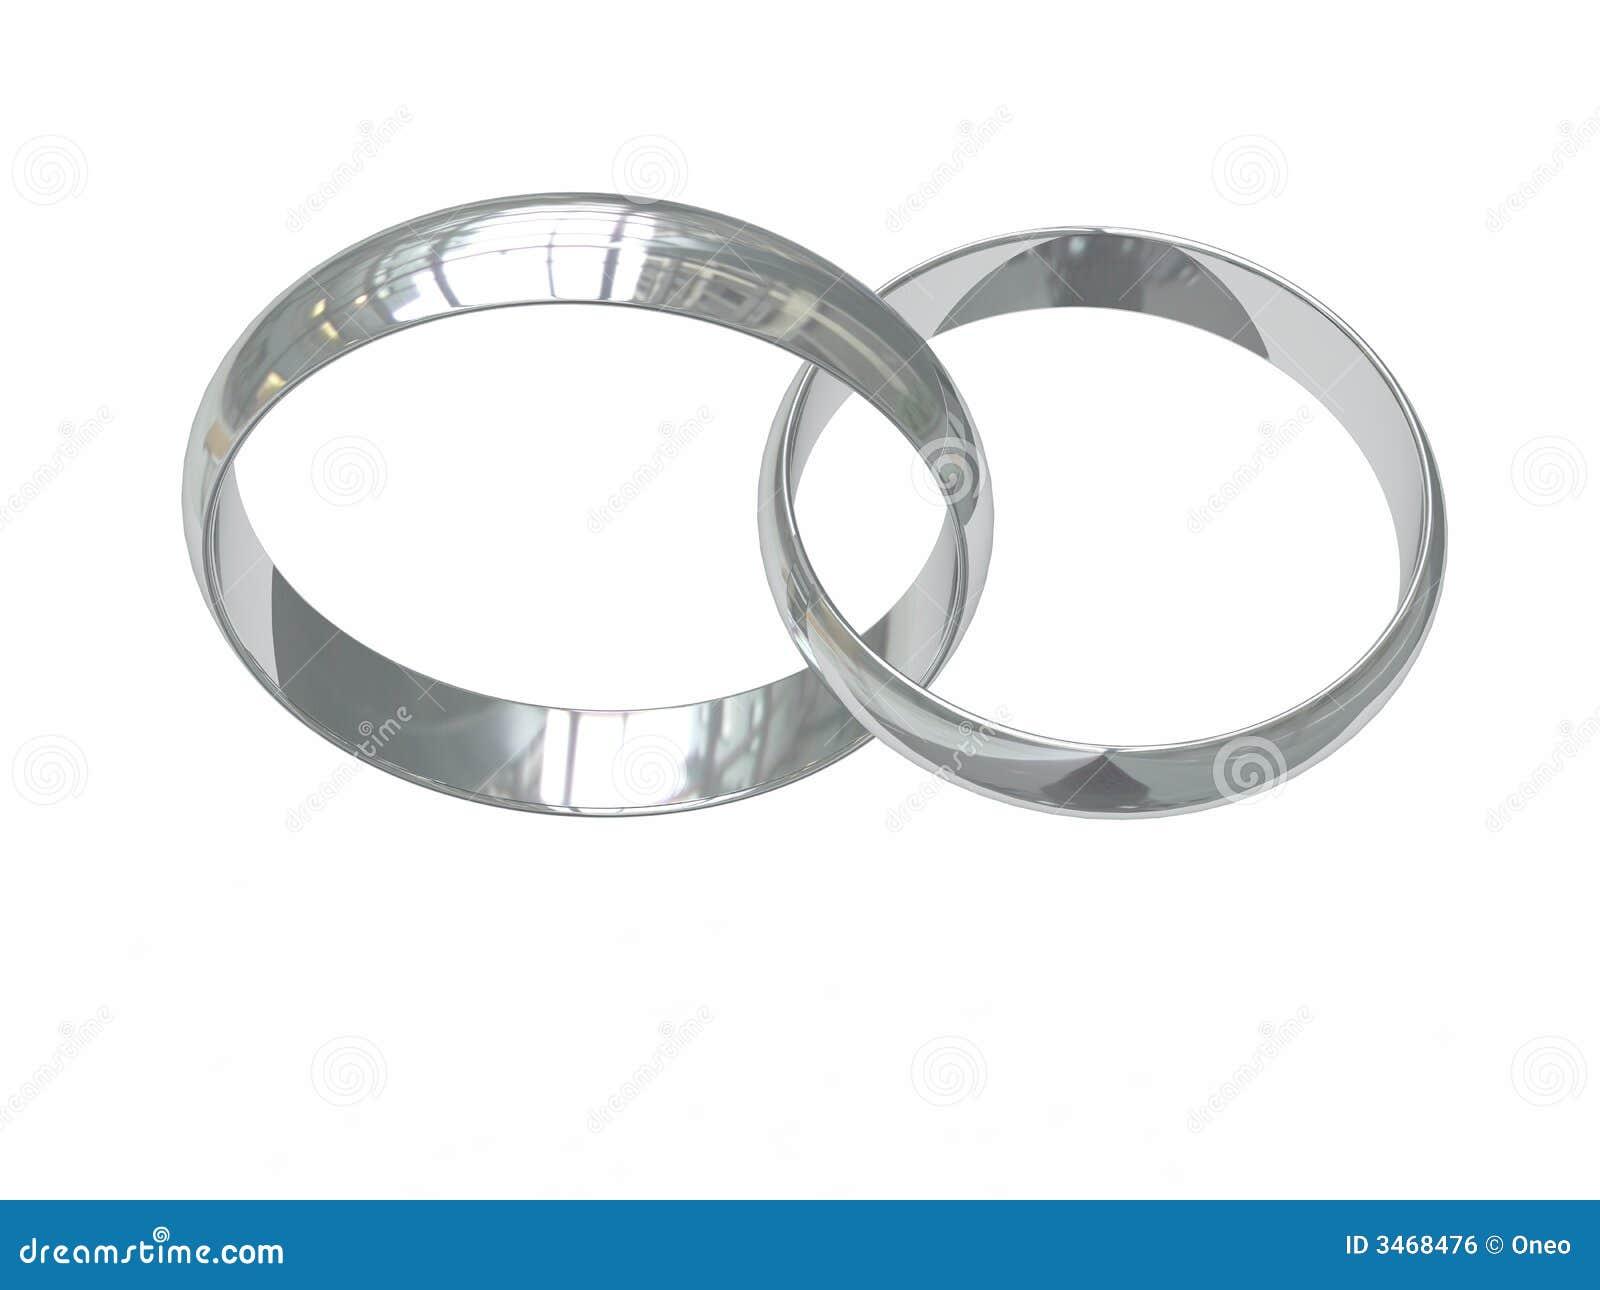 Two platinum wedding rings stock illustration Image of bride